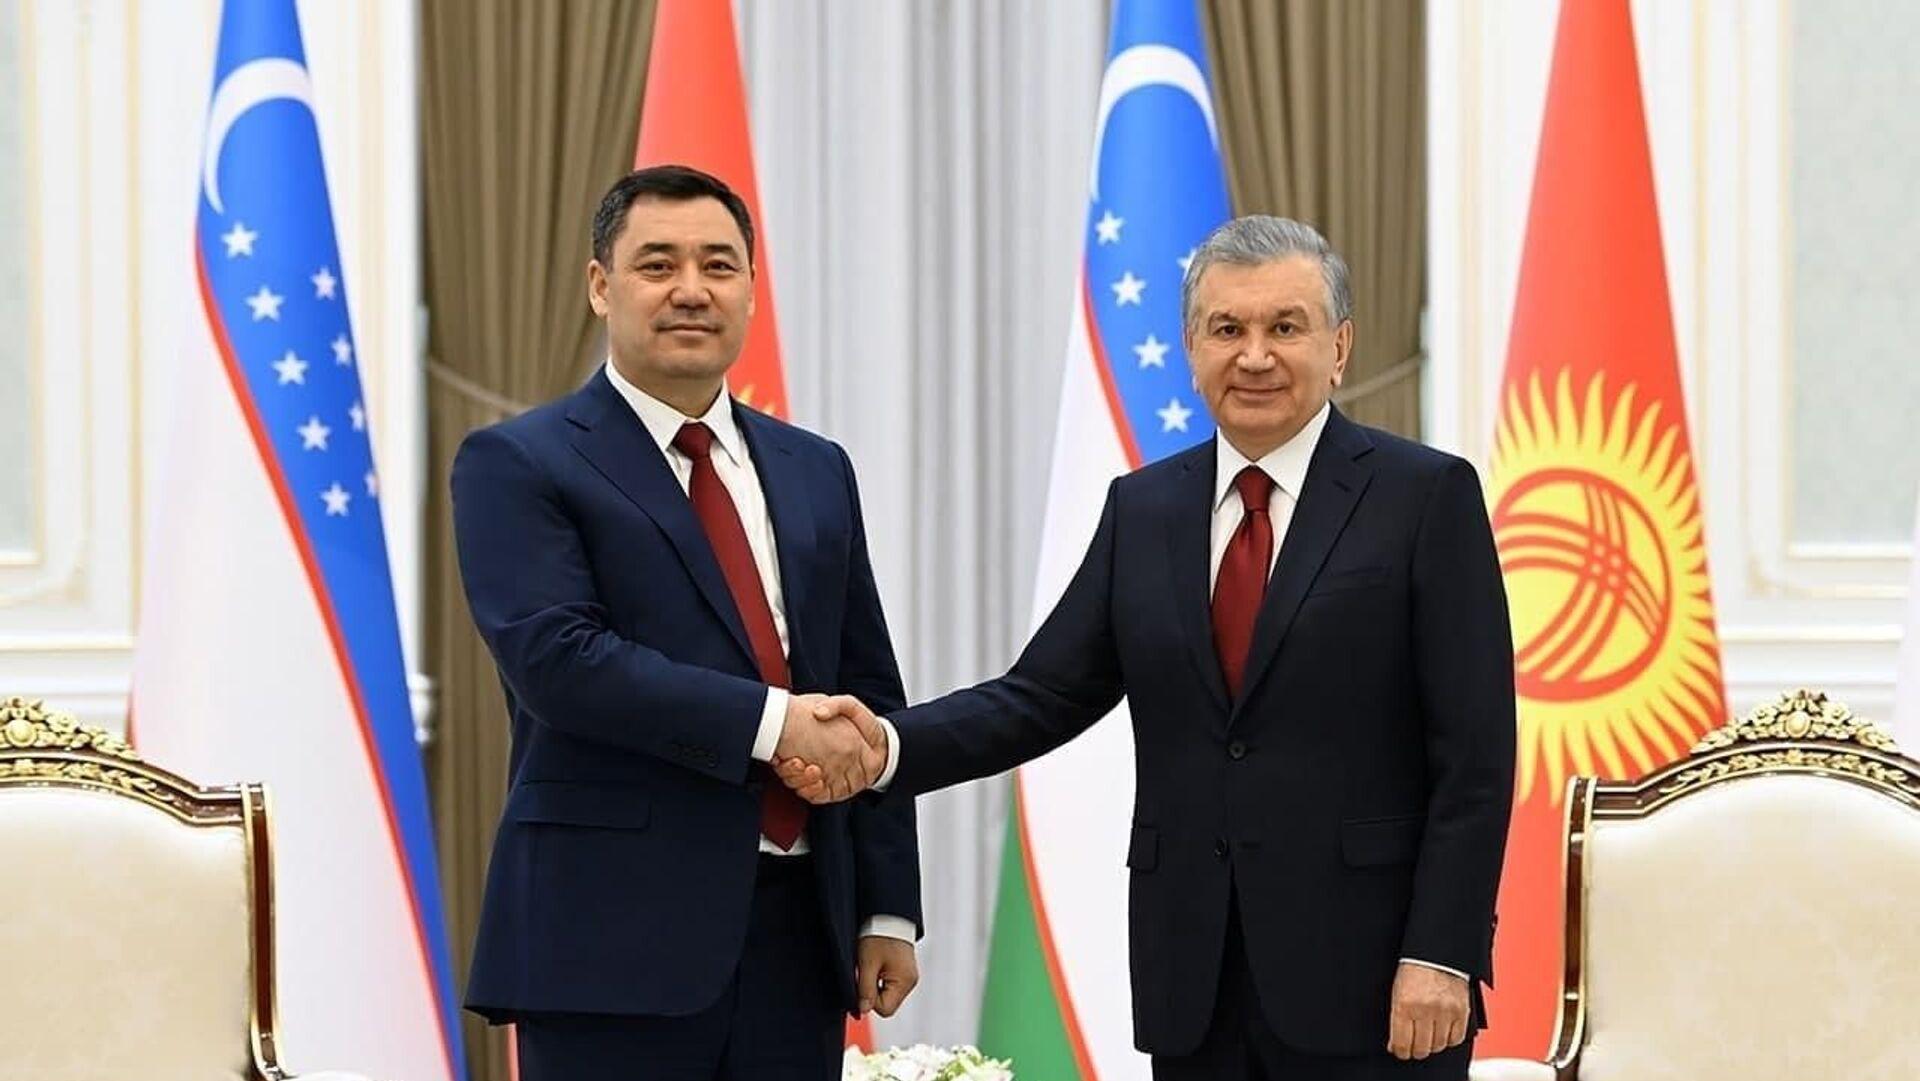 Президент Узбекистана Шавкат Мирзиёев и президент Кыргызстана Садыр Жапаров - Sputnik Таджикистан, 1920, 11.03.2021